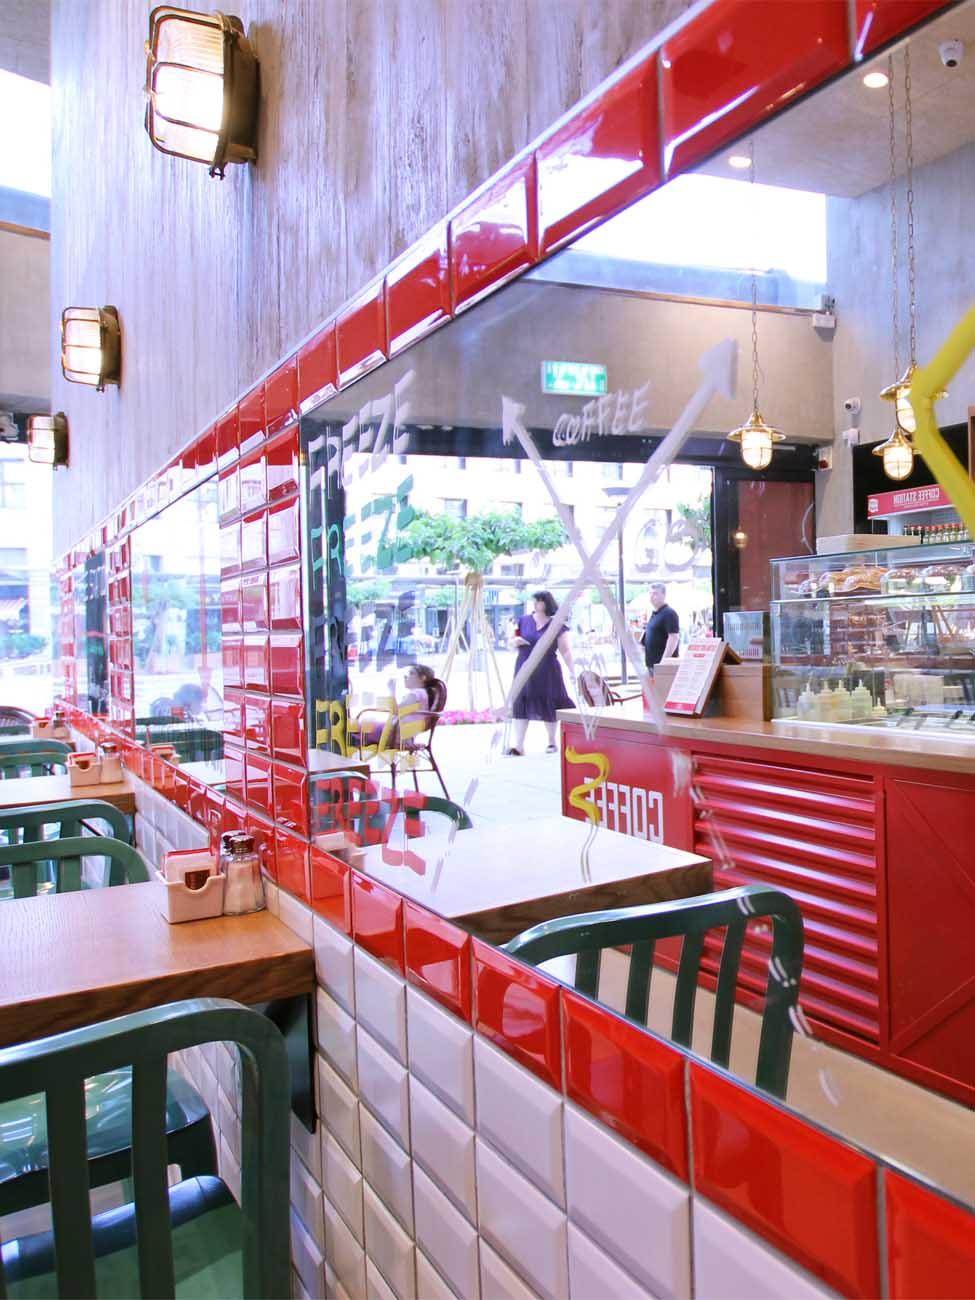 7A_Coffee Station Hertzelia.jpg